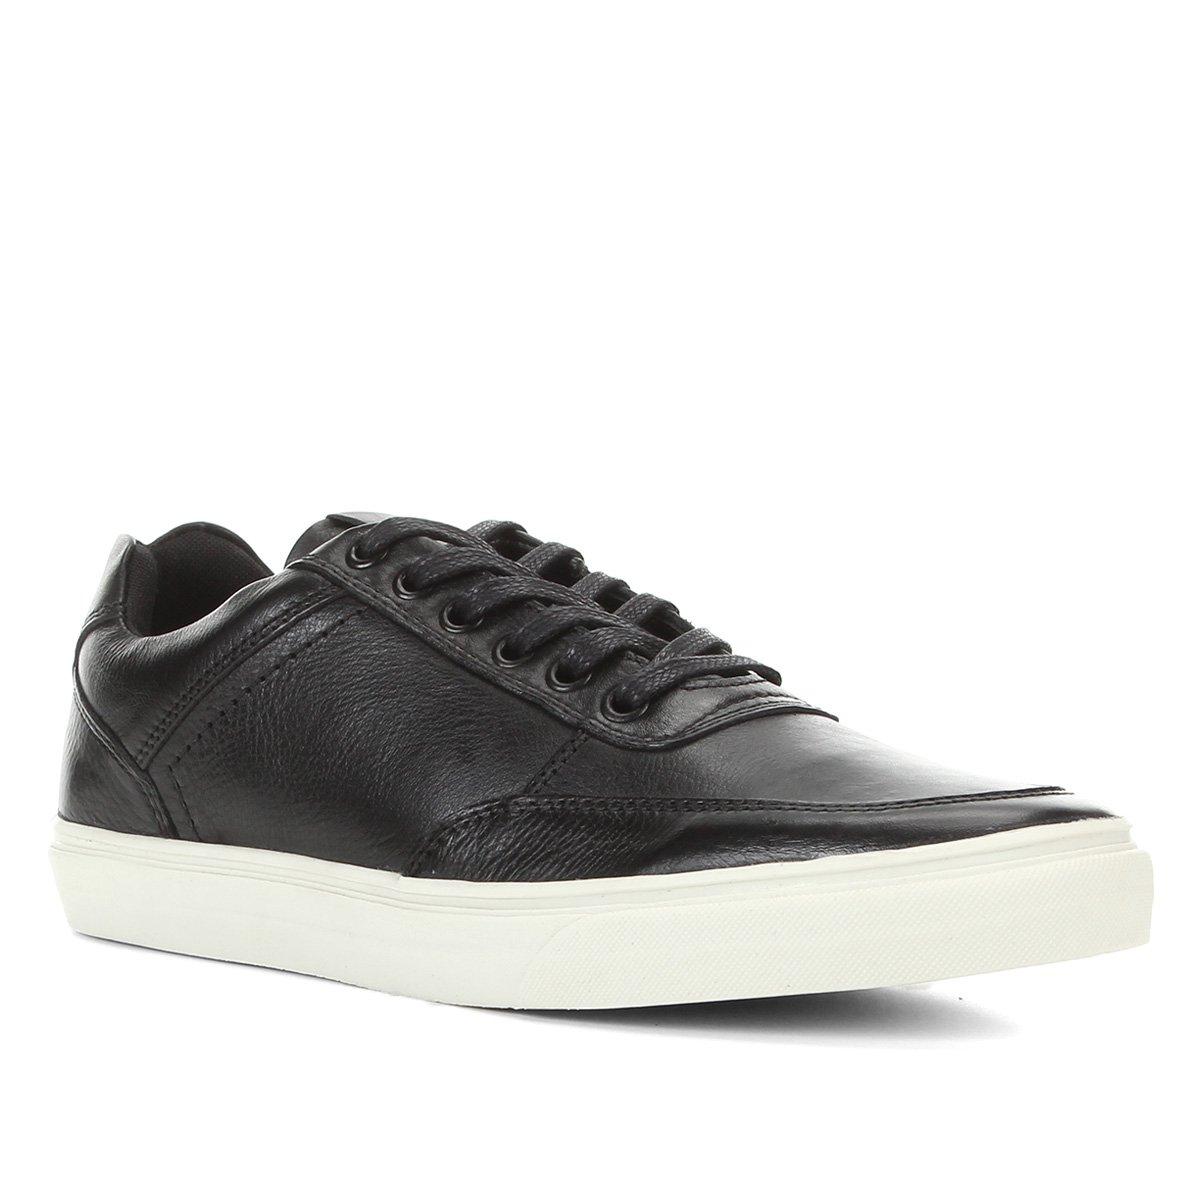 Sapatênis Couro Shoestock Napa Liso Masculino